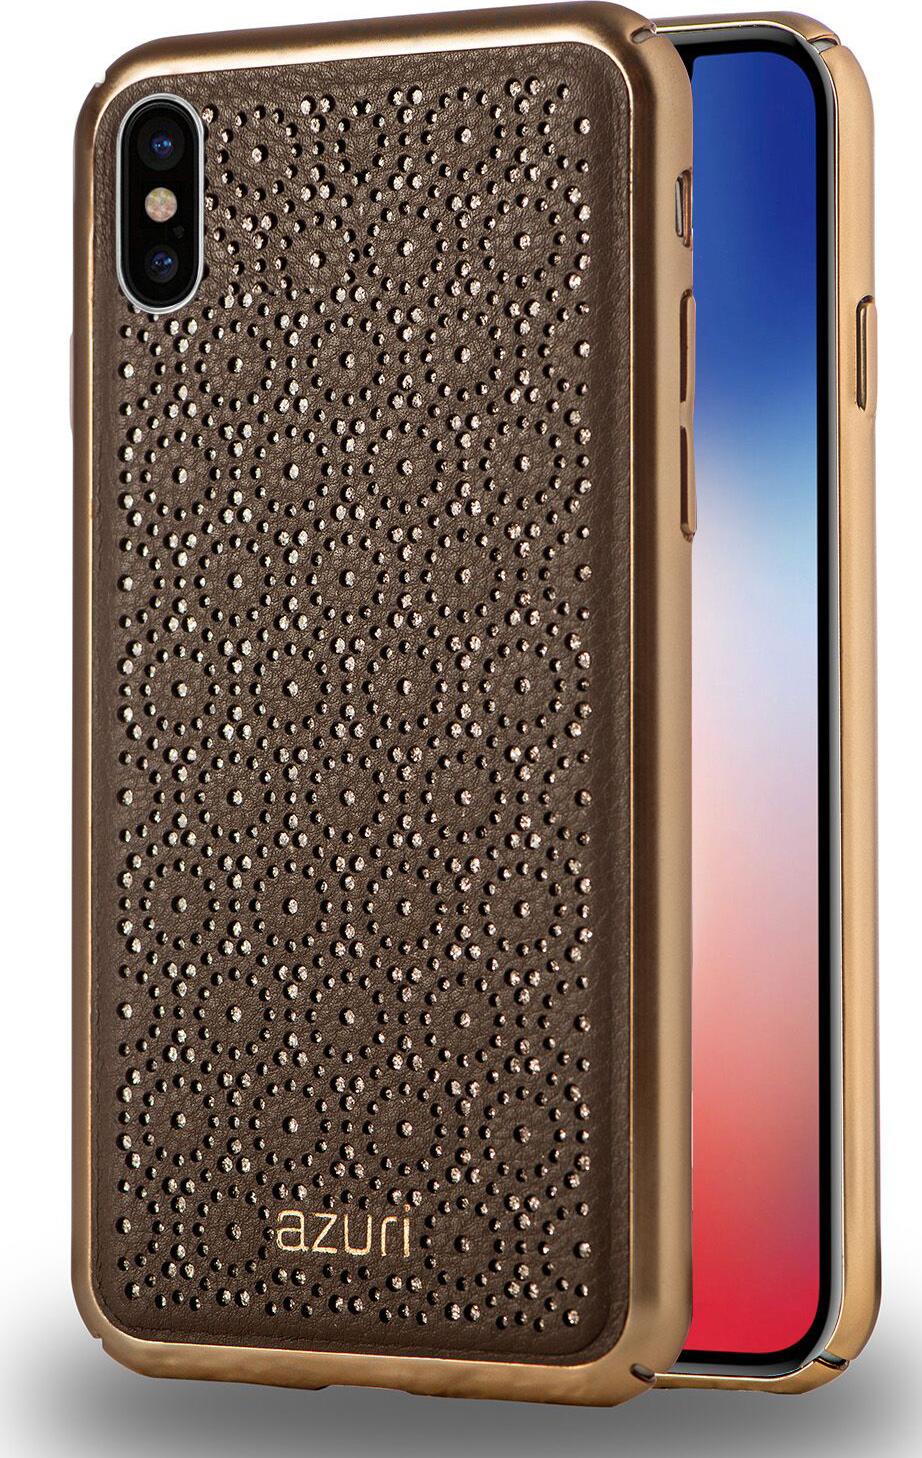 Azuri Elegante Cover Flower - grey - for iPhone X/Xs | Azuri Mobile